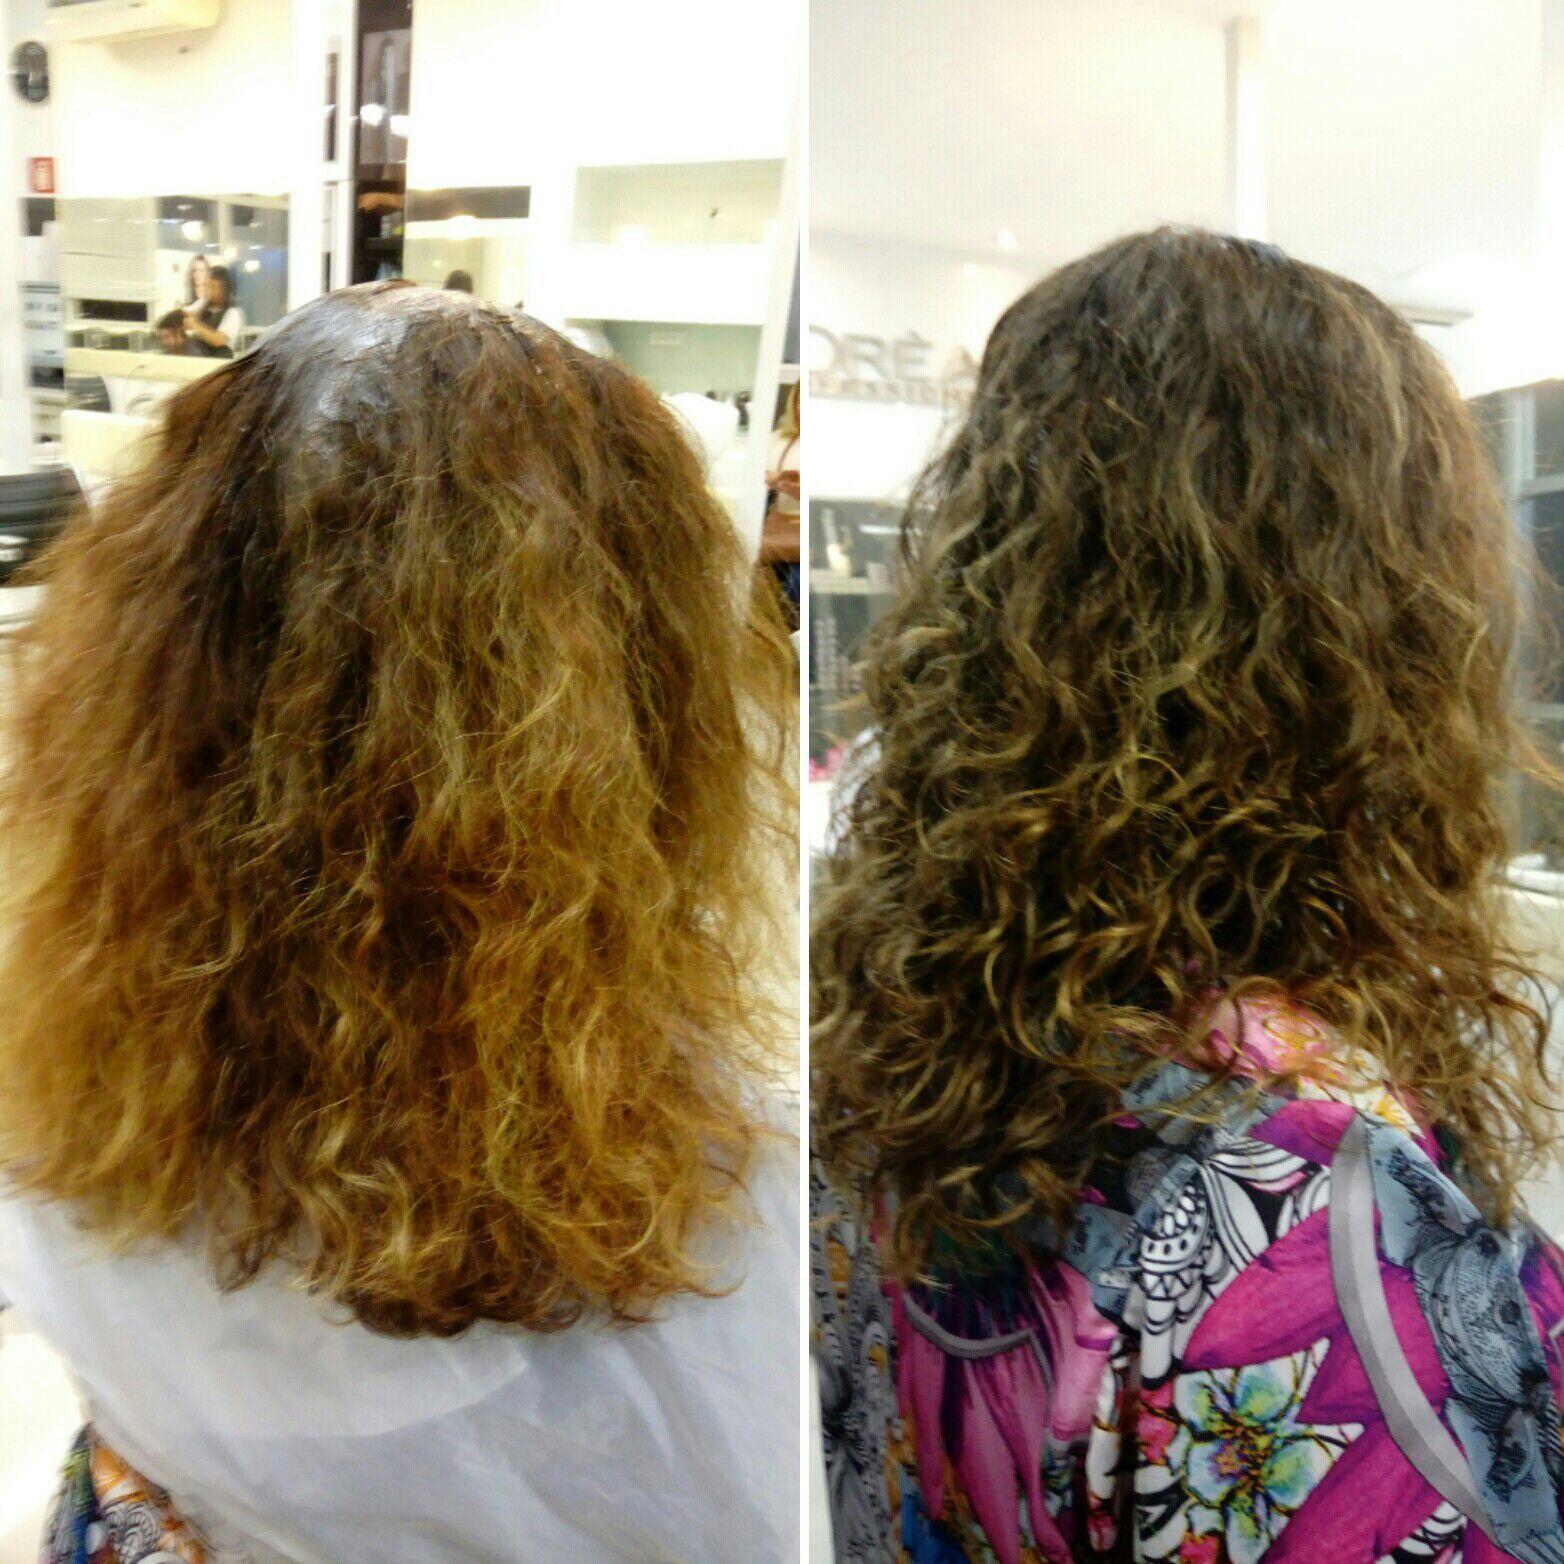 esteticista cabeleireiro(a) designer de sobrancelhas cabeleireiro(a) esteticista cabeleireiro(a)